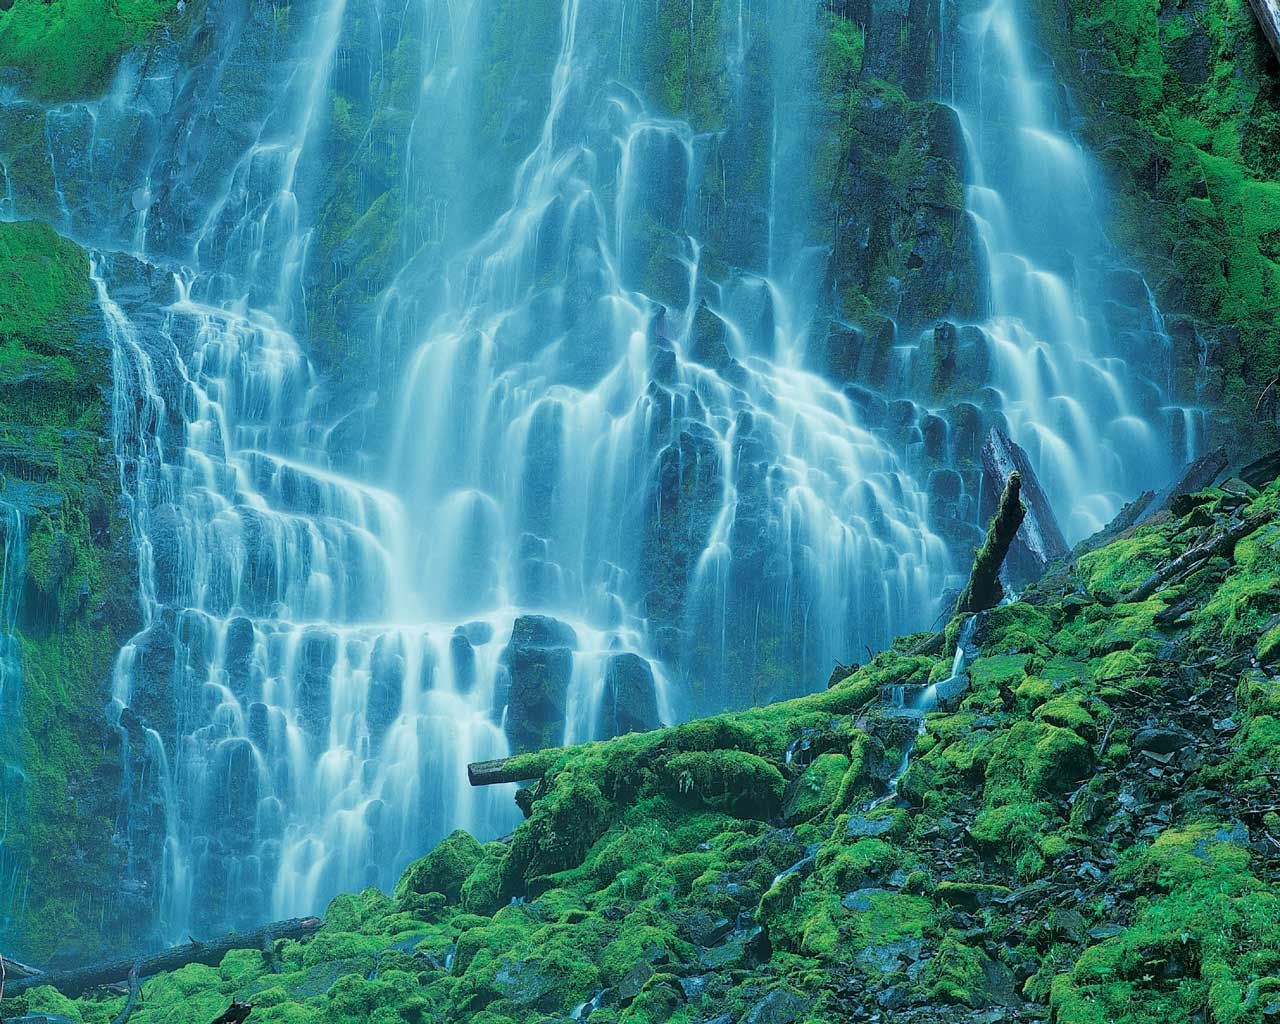 Waterfalls-Waterfall-En-Imgs-Mobile ...